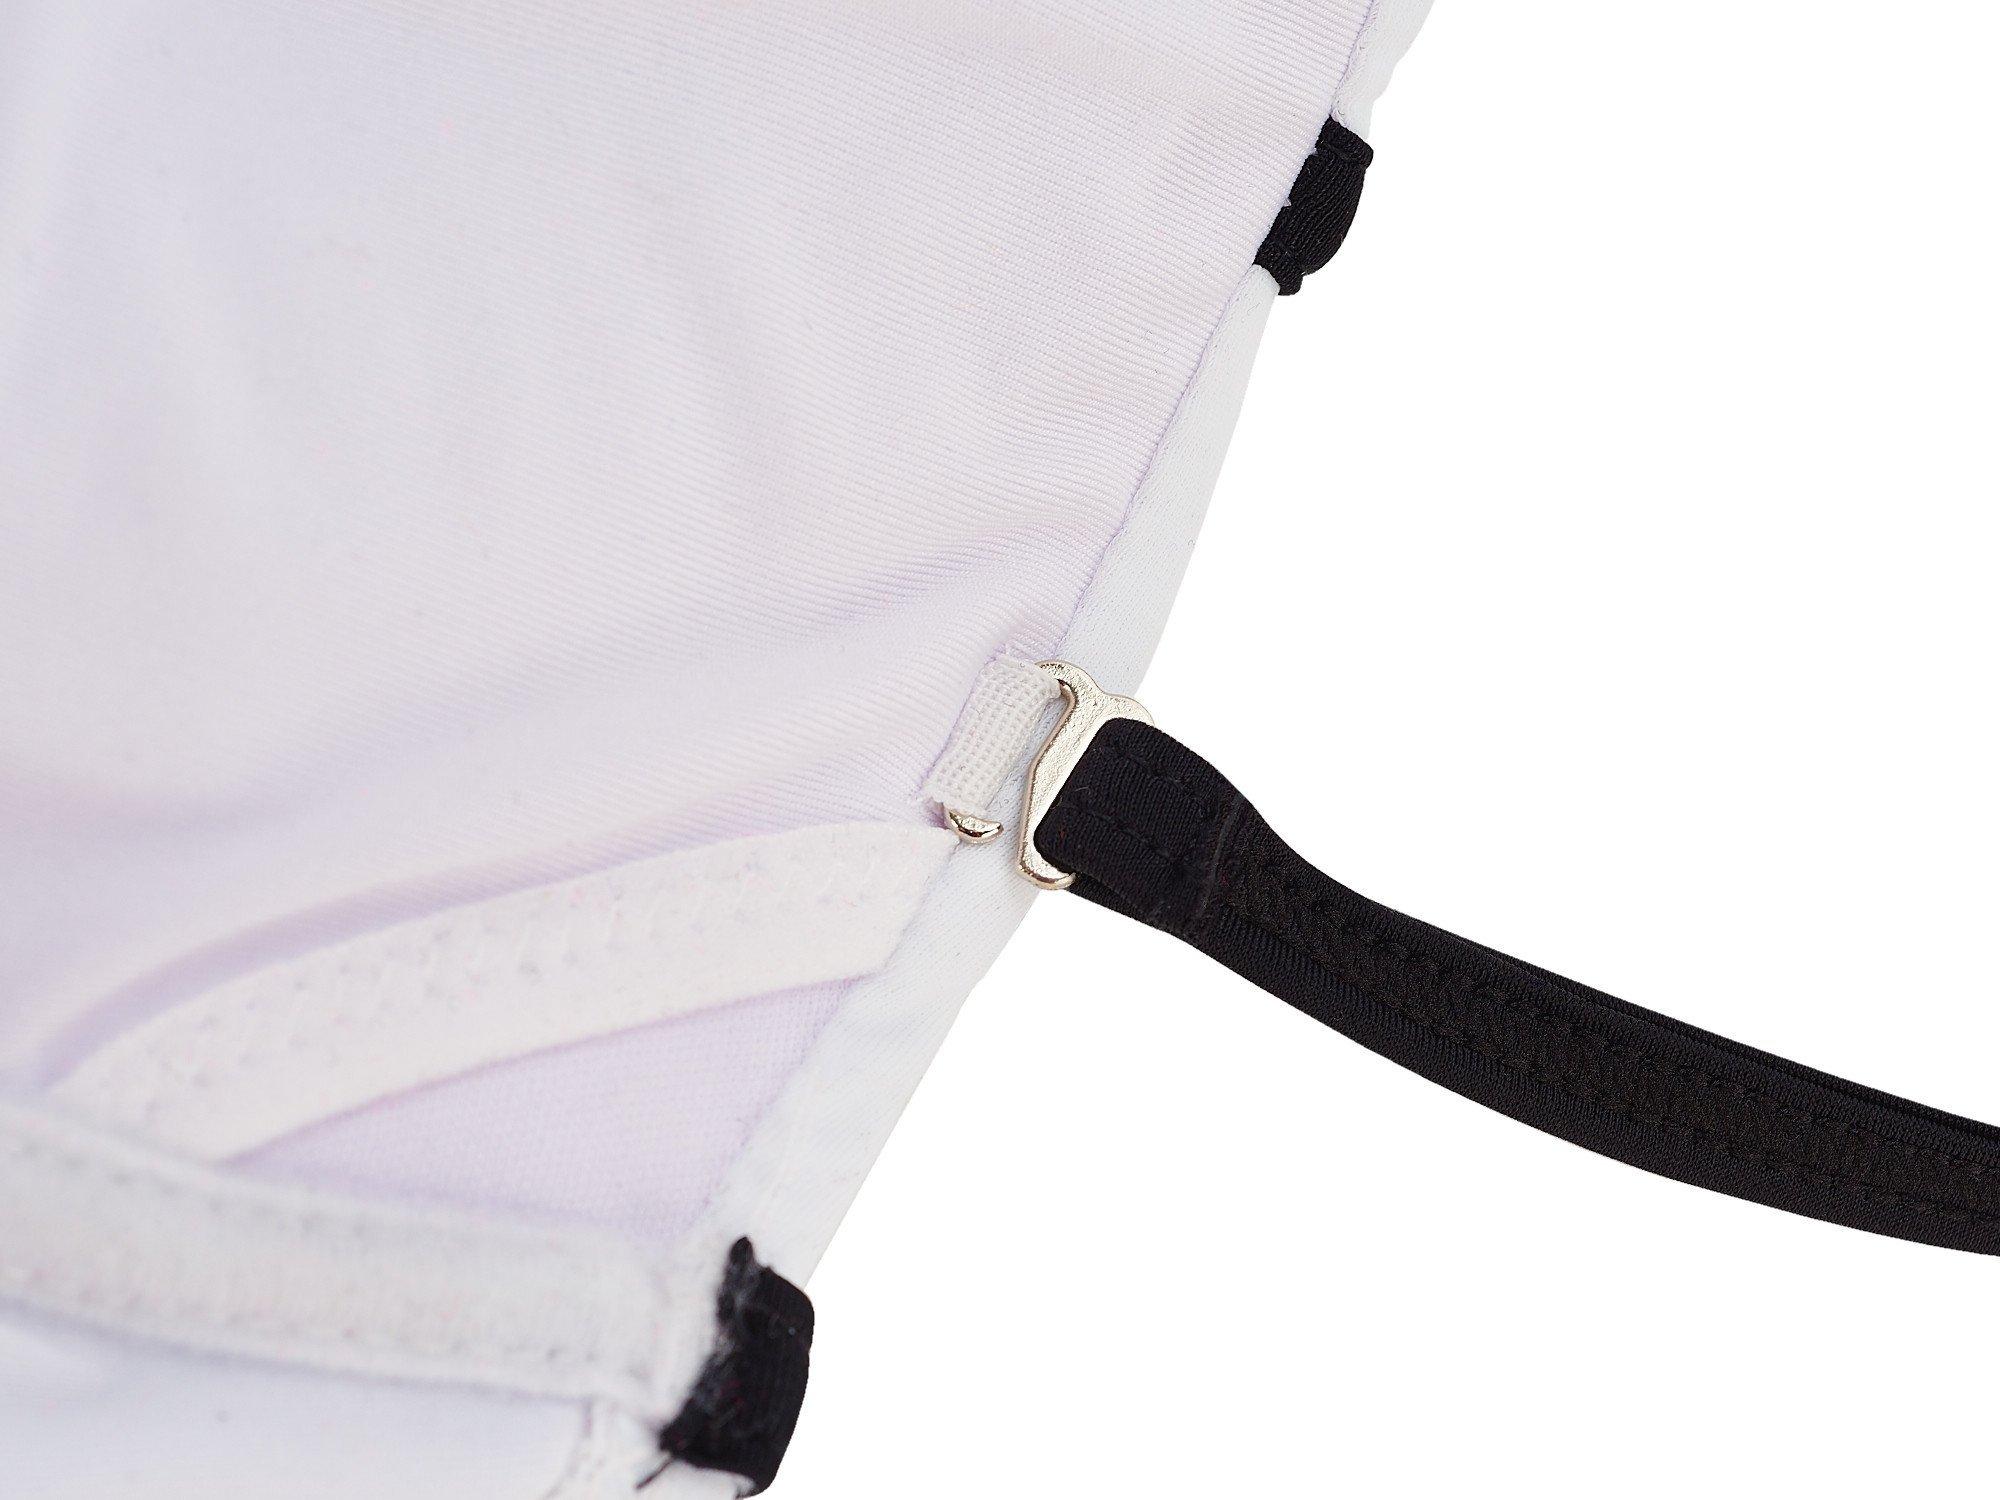 LA PLAGE Women's Colorful High Waist Padded Bathing Suit Size US XX-Large White by LA PLAGE (Image #7)